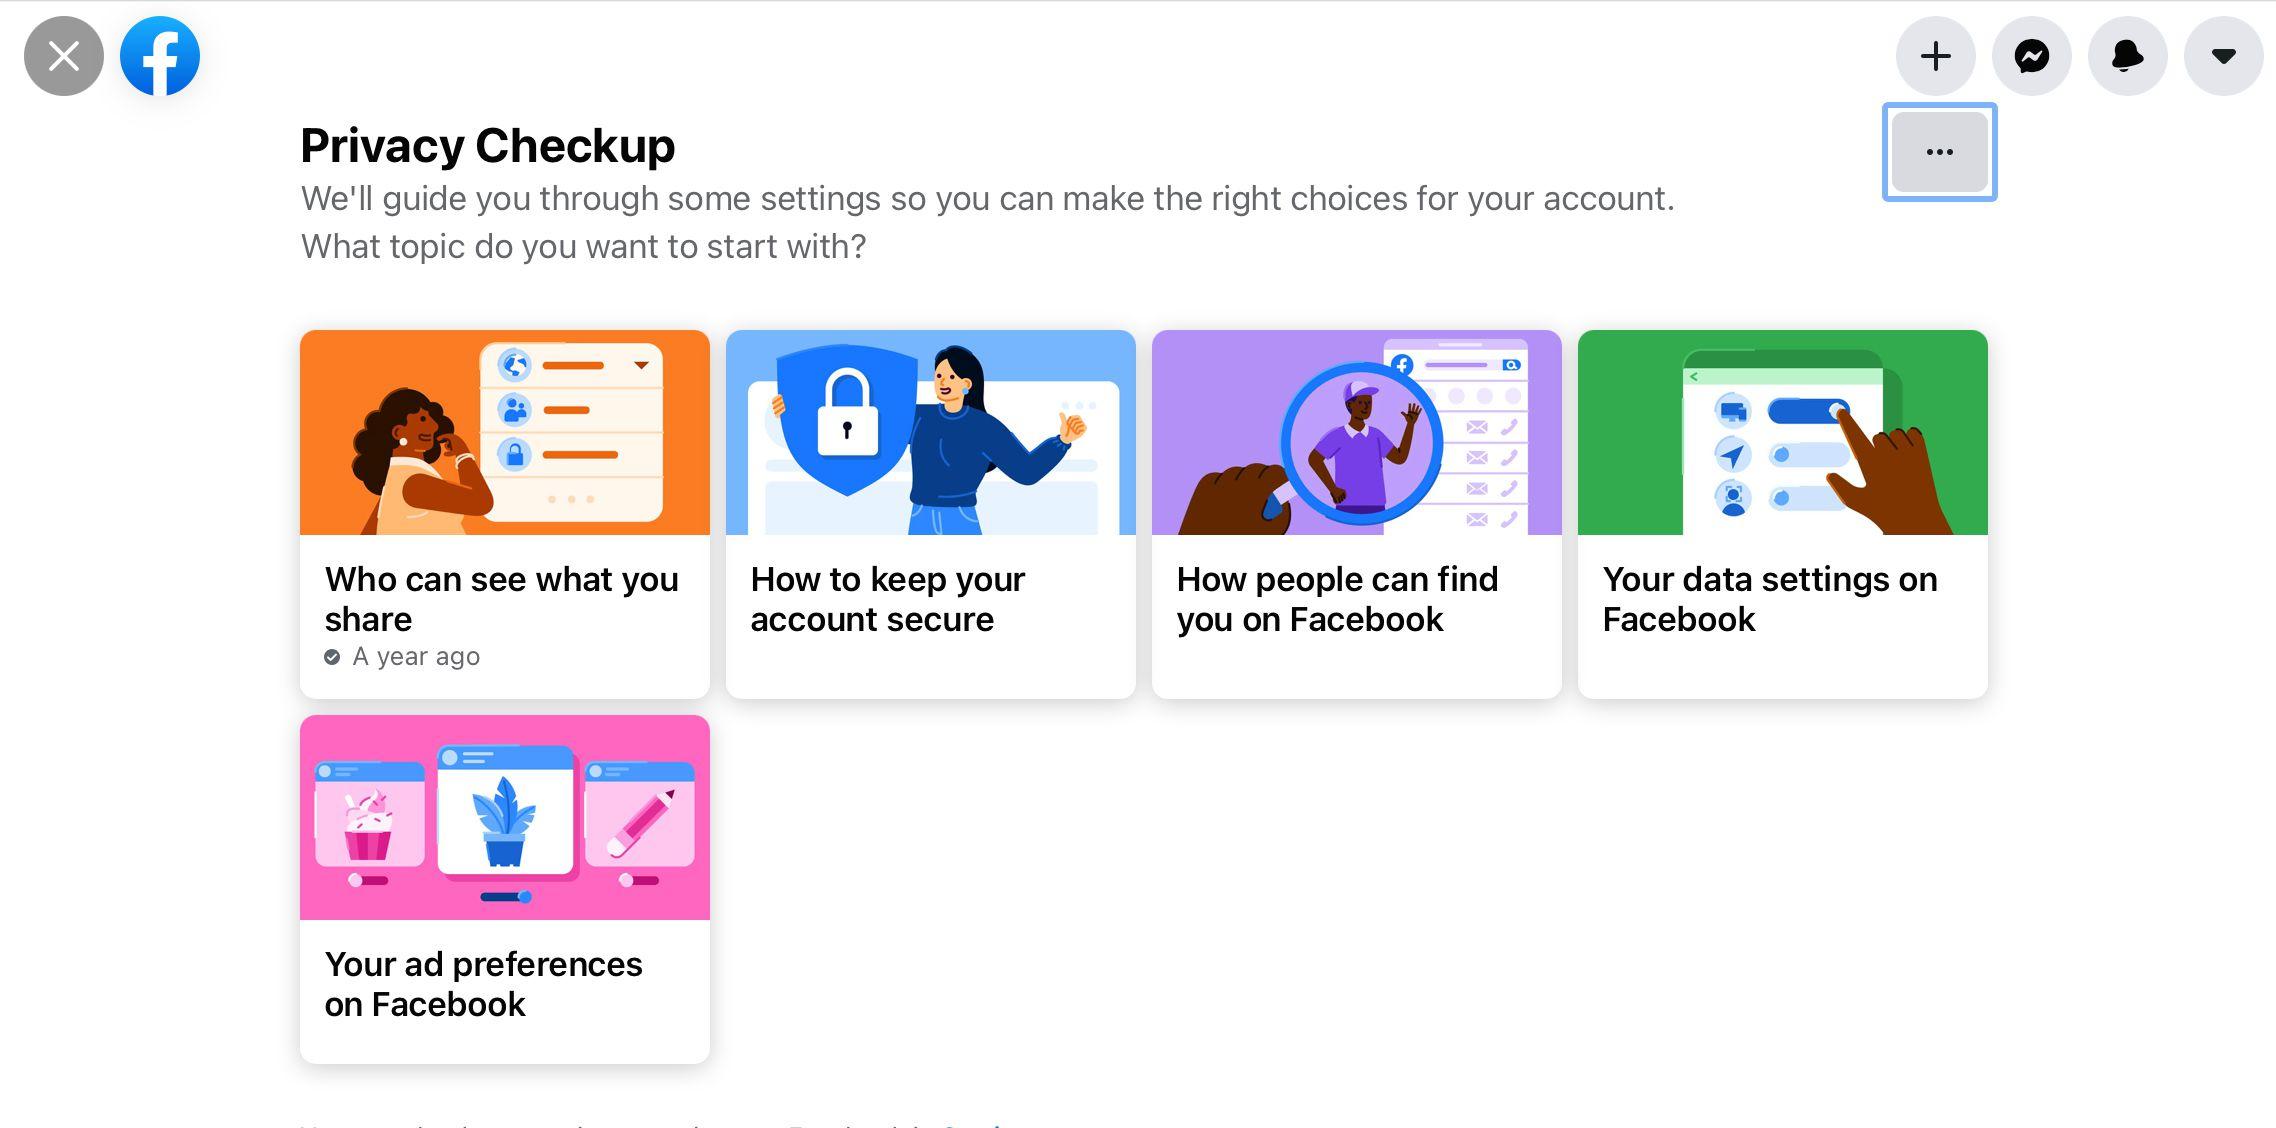 Privacy Checkup main screen in Facebook